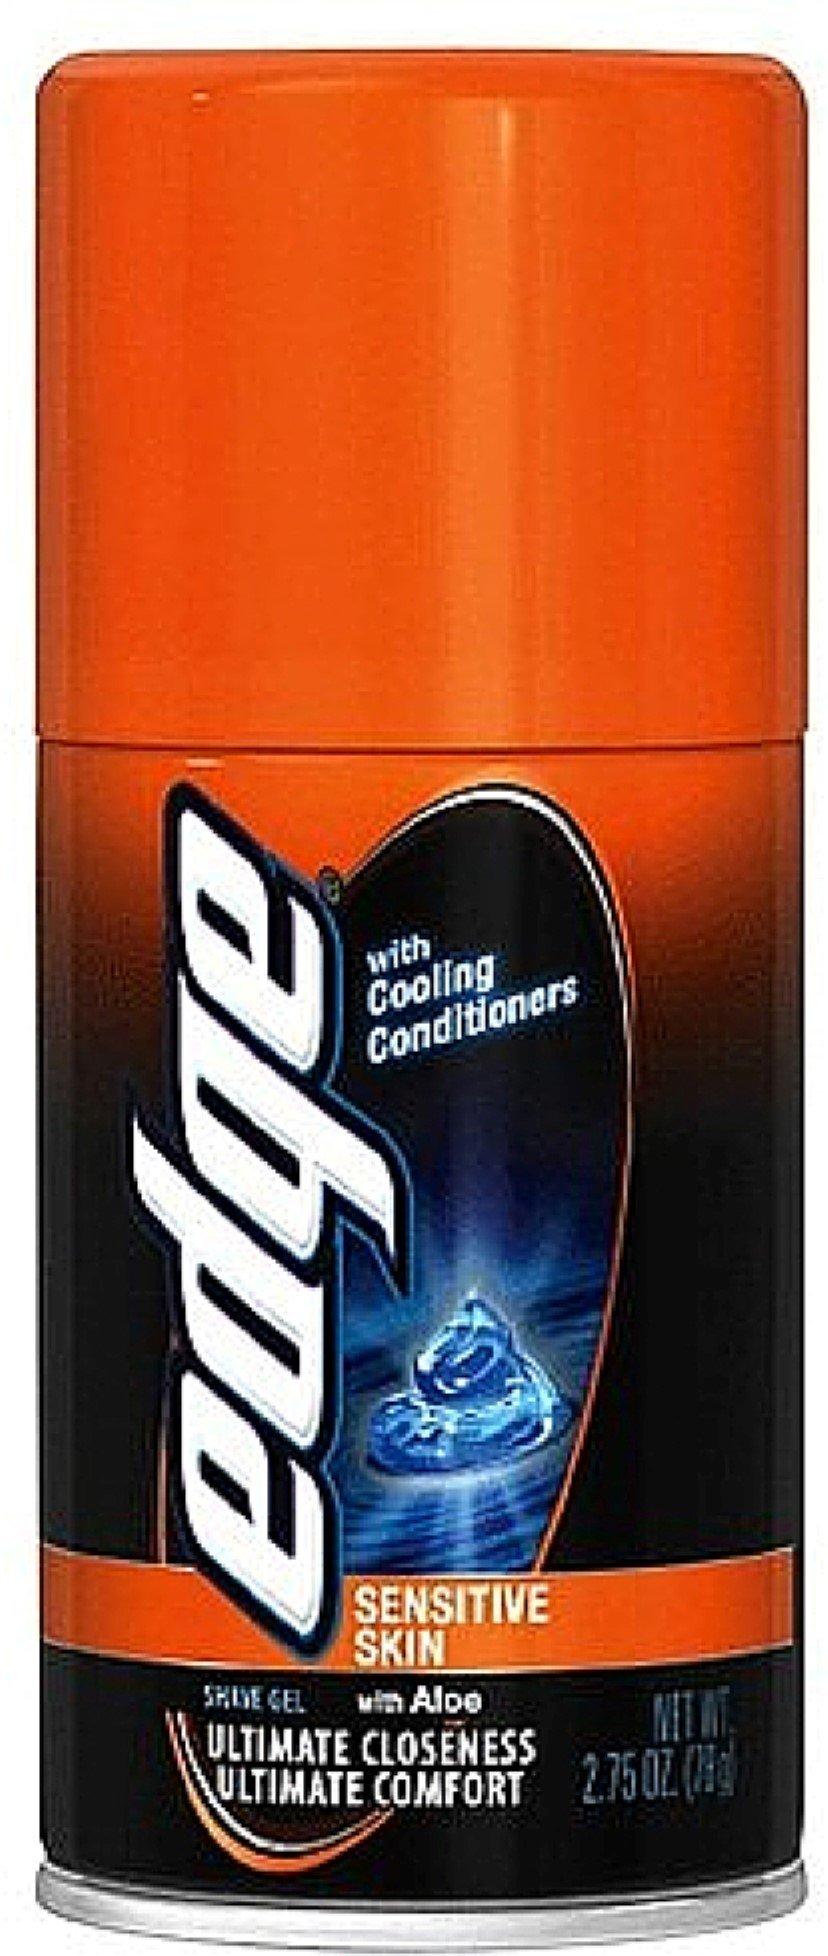 Edge Shave Gel, Sensitive Skin with Aloe 2.75 oz (Pack of 2)